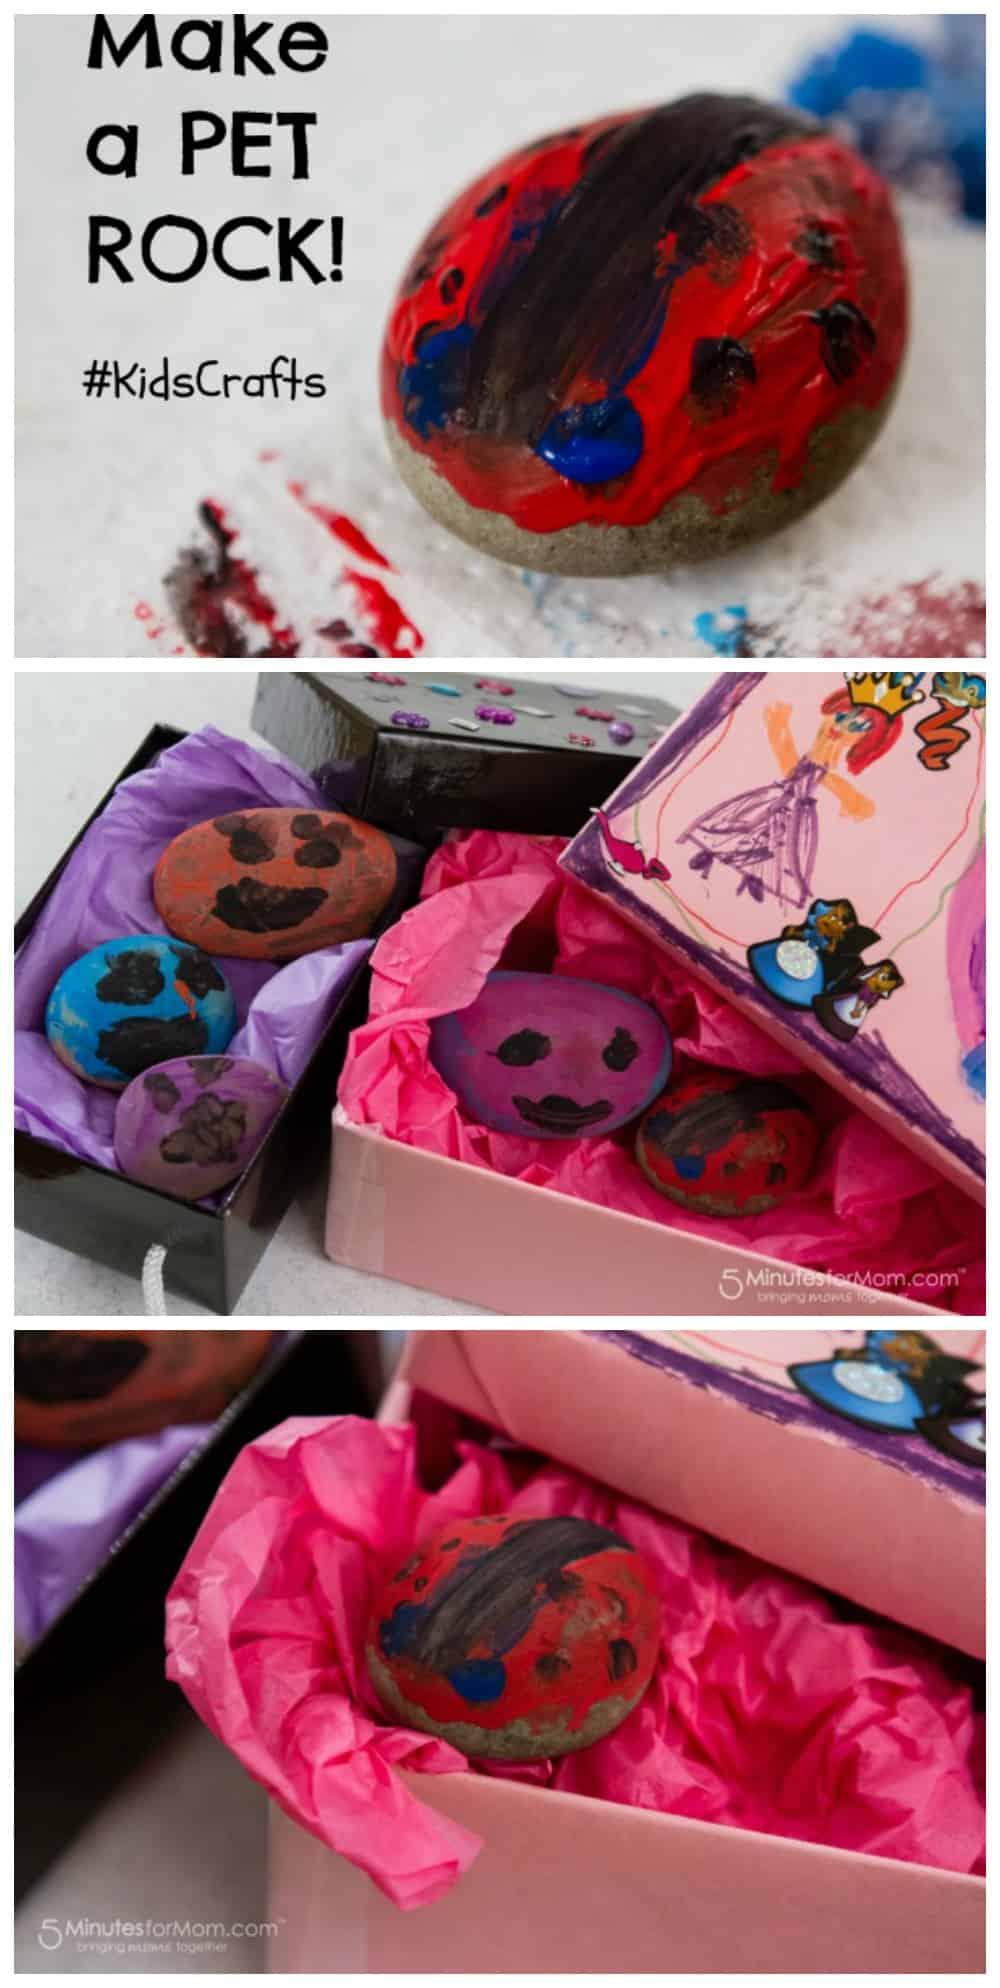 Make a Pet Rock - Craft for Kids